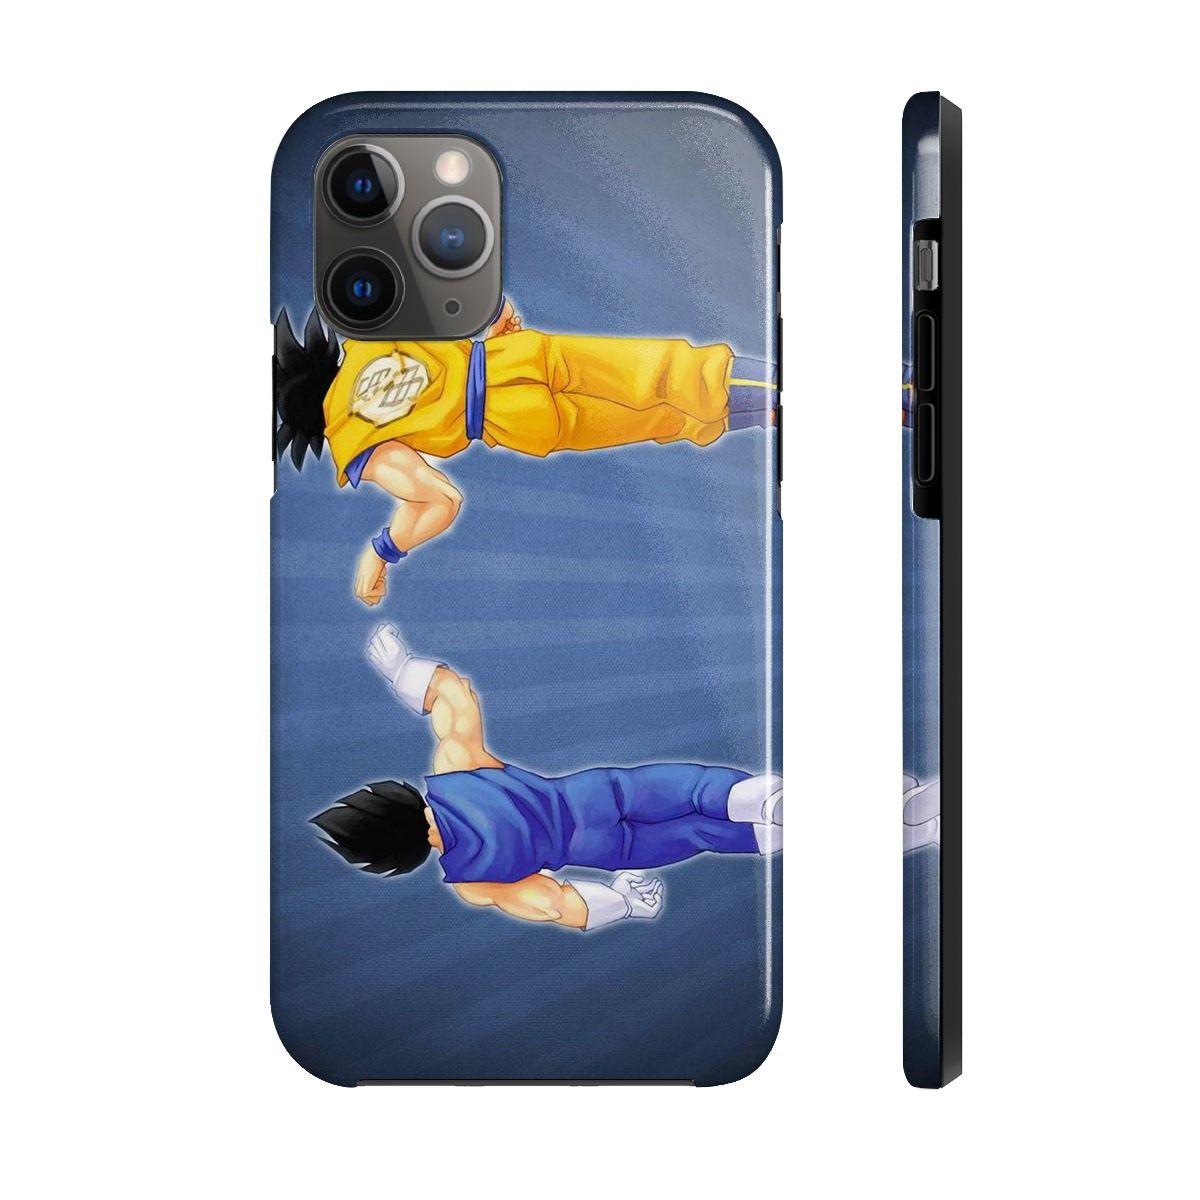 Dragon Ball Z 522282 Tough Phone Case In 2020 Phone Cases Dragon Ball Z Dragon Ball